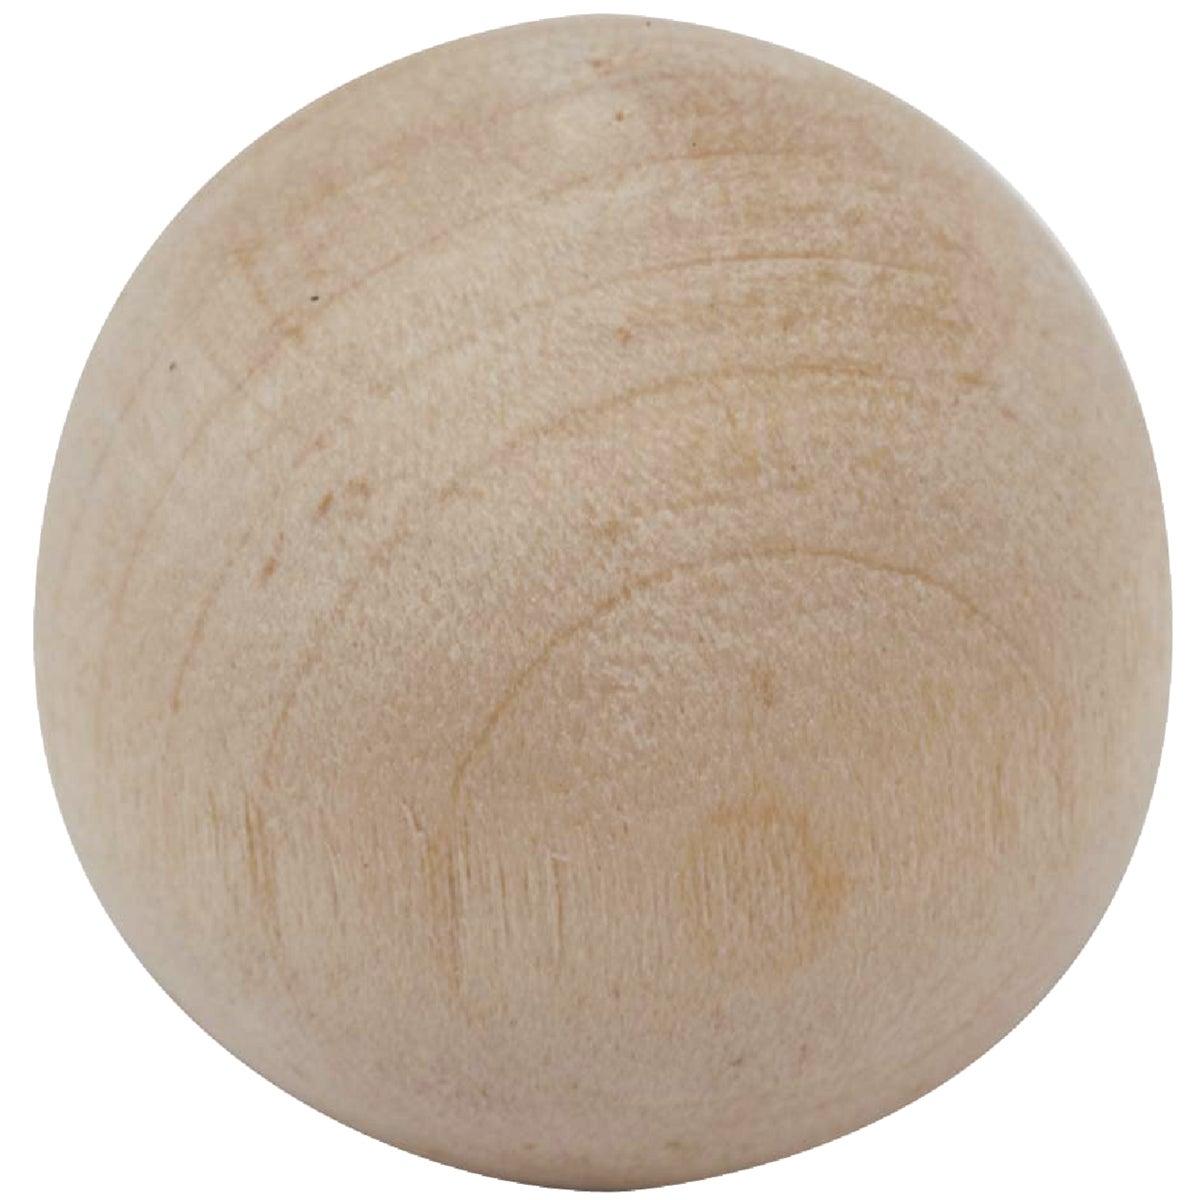 "1-1/2""HARDWOOD BALL KNOB - 11405DI-1.5 by Waddell Mfg Company"